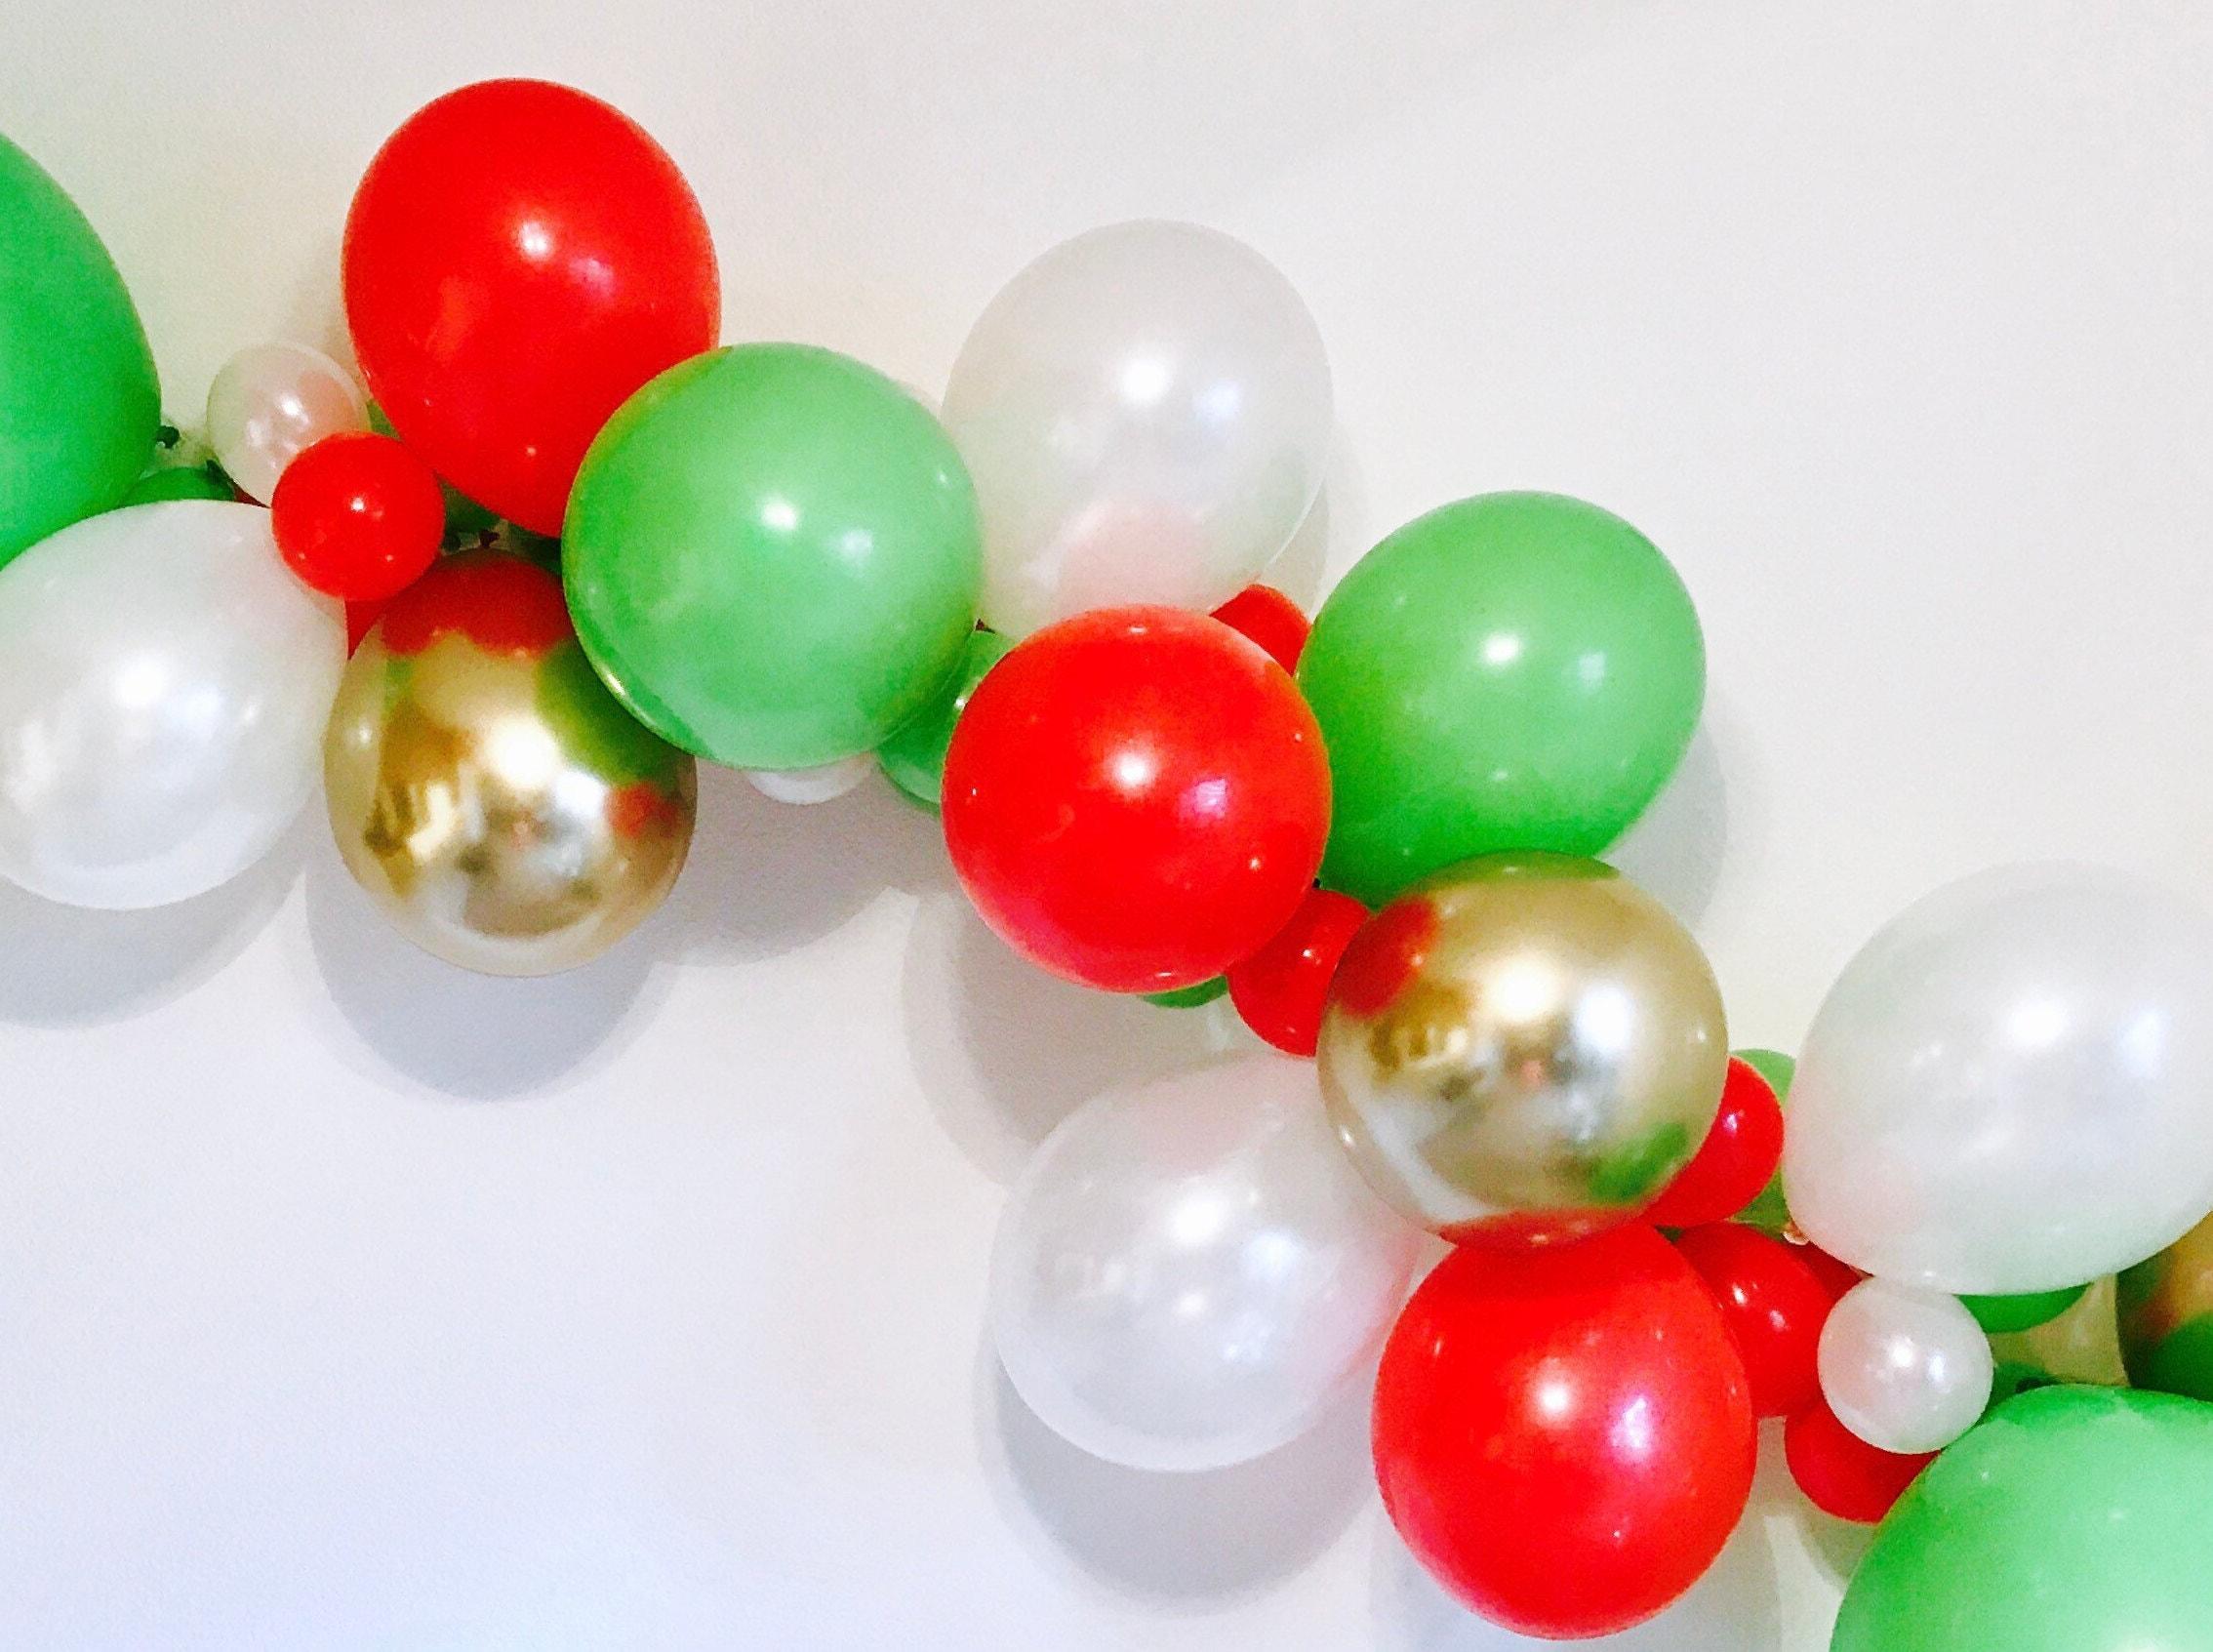 Christmas Balloon Garland Holiday Balloon Garland Christmas Party Decor Christmas Balloons Red Gold Green Balloons Merry Friendsmas